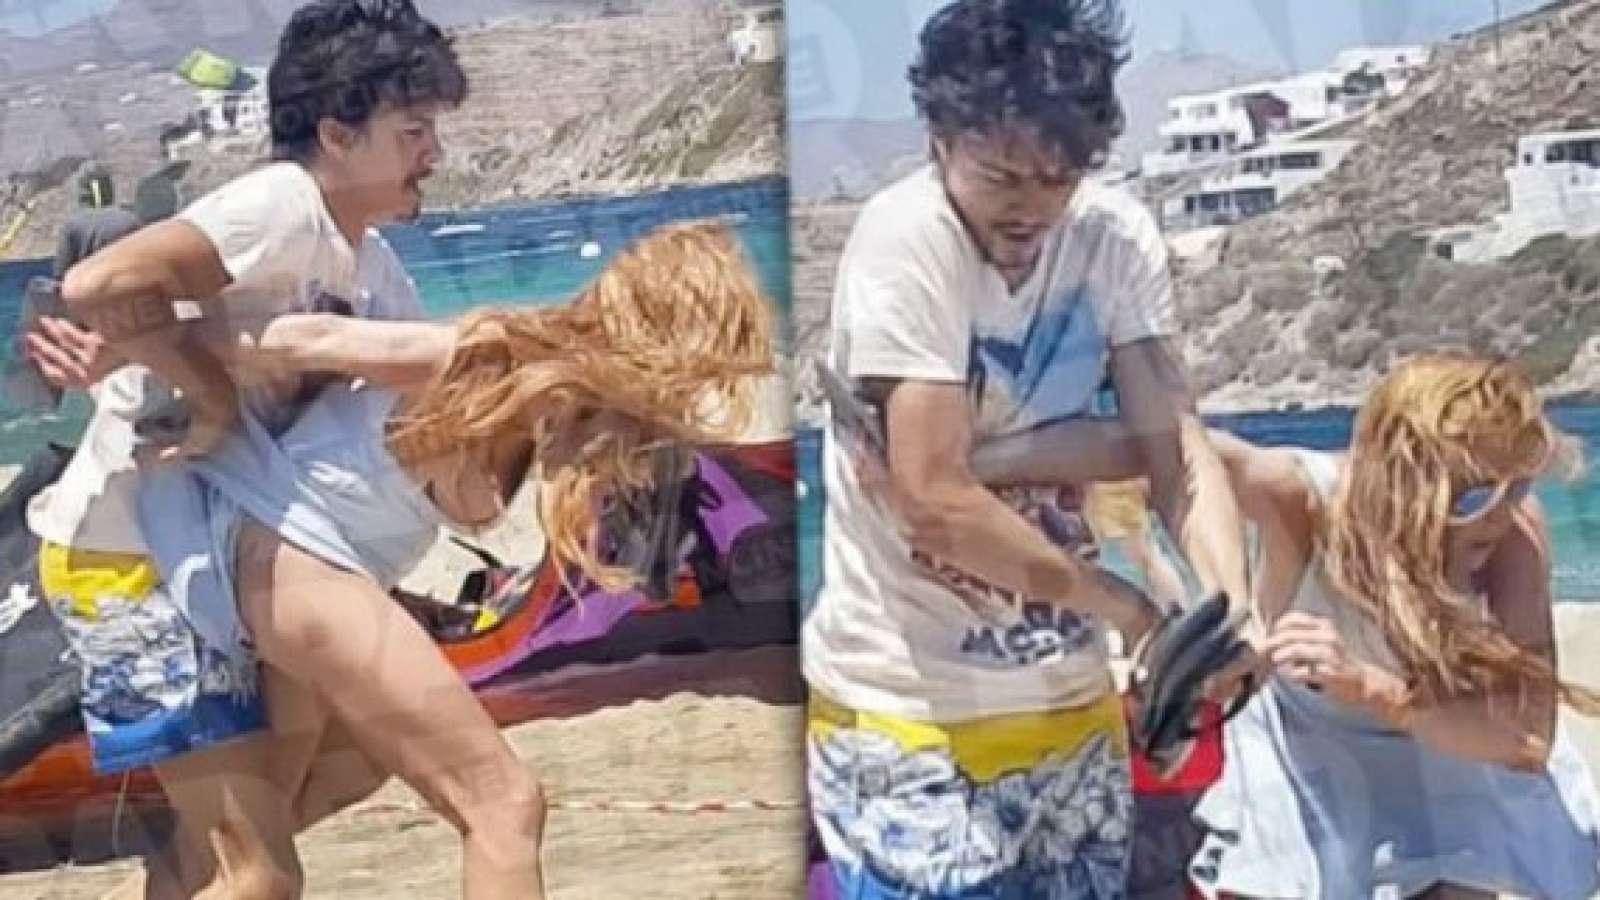 Lindsay-Lohan-Egor-Tarabasov-in-beach-scuffle (1)